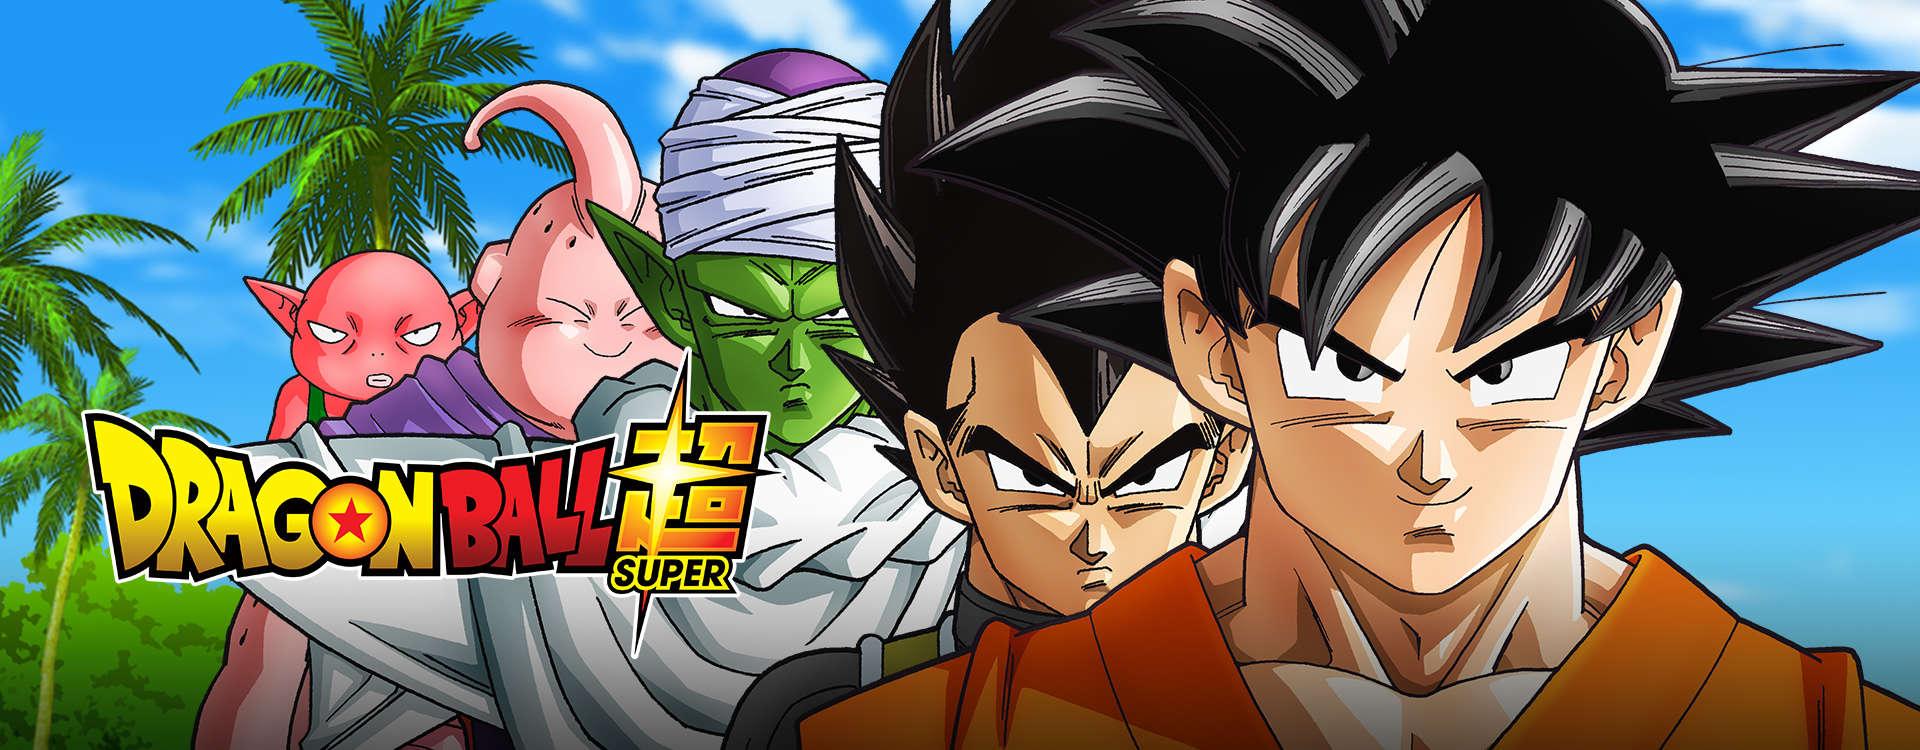 Stream & Watch Dragon Ball Super Episodes Online - Sub & Dub